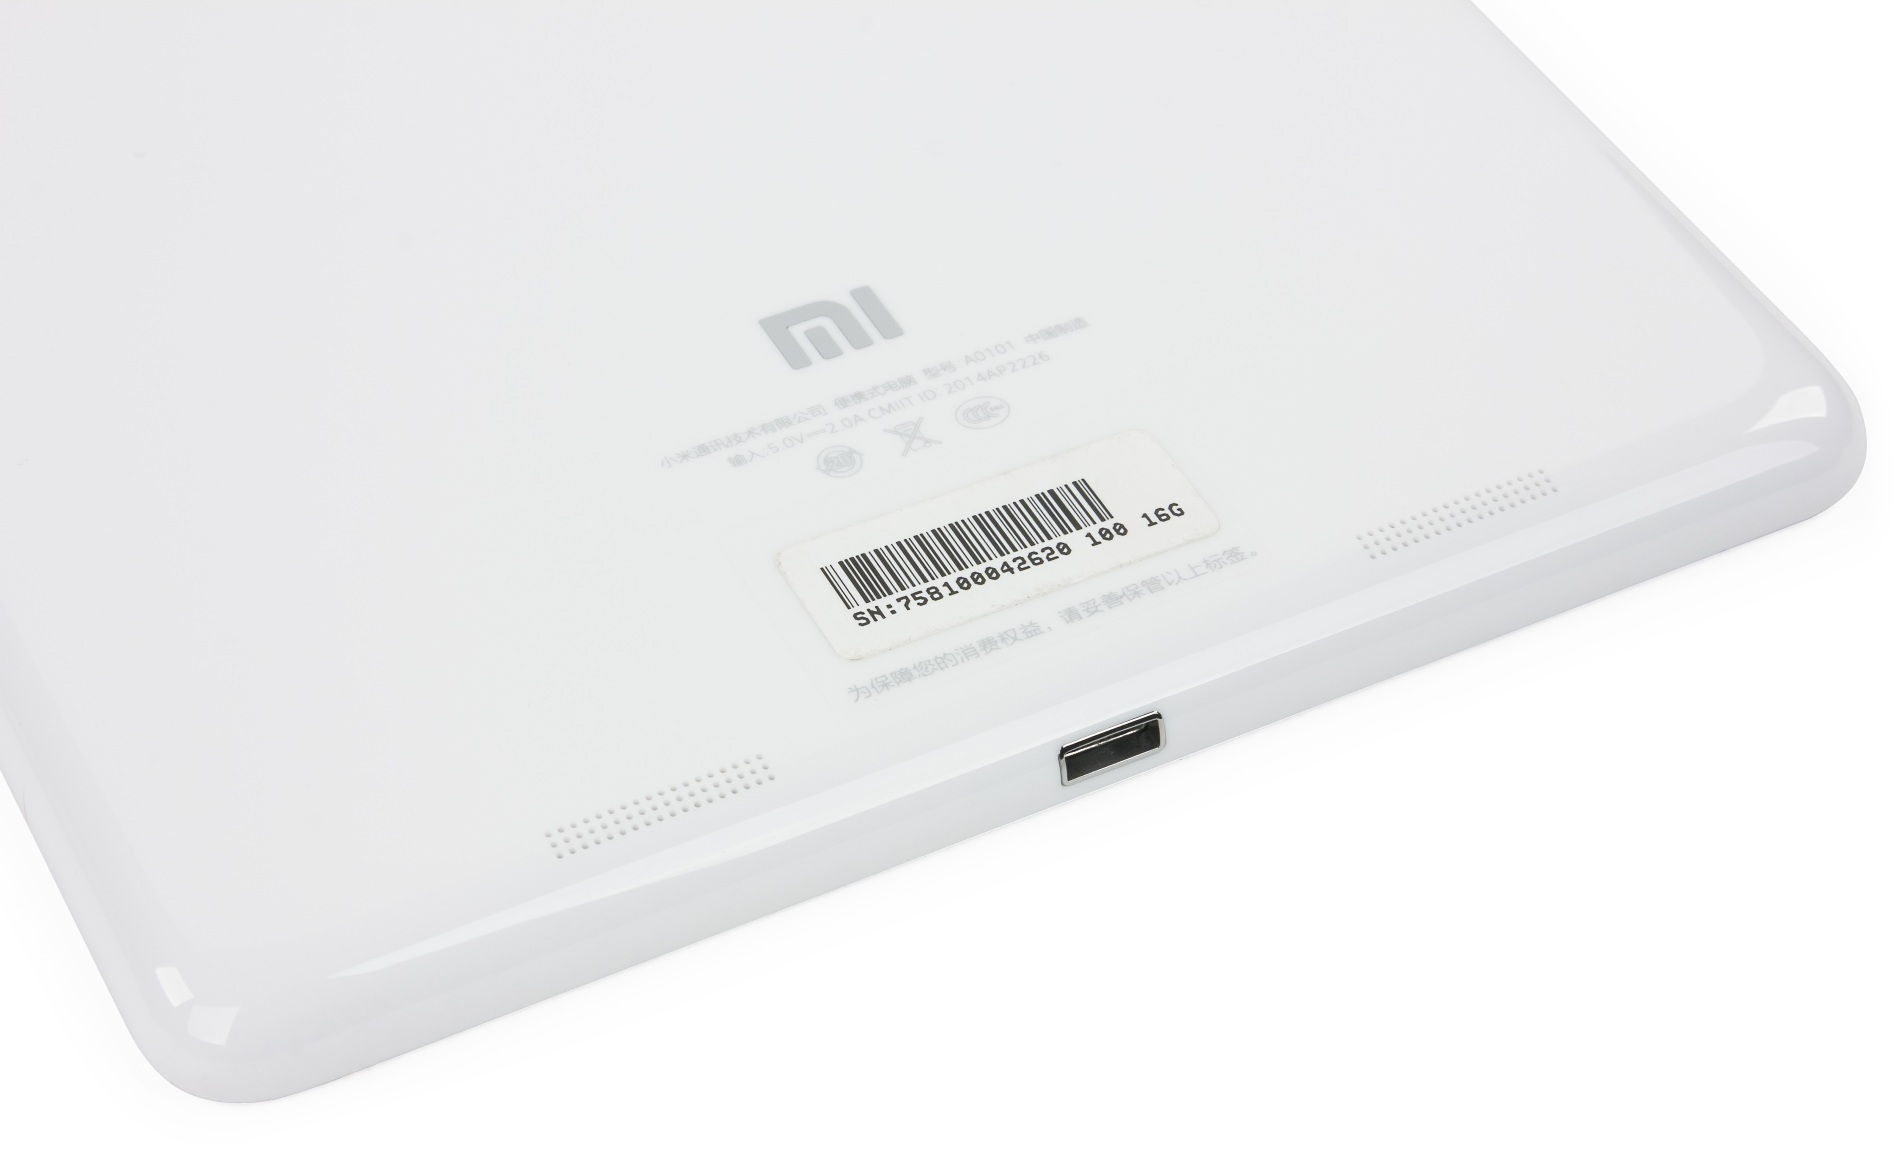 Xiaomi Mi Pad 7,9 16Gb - Нижняя грань